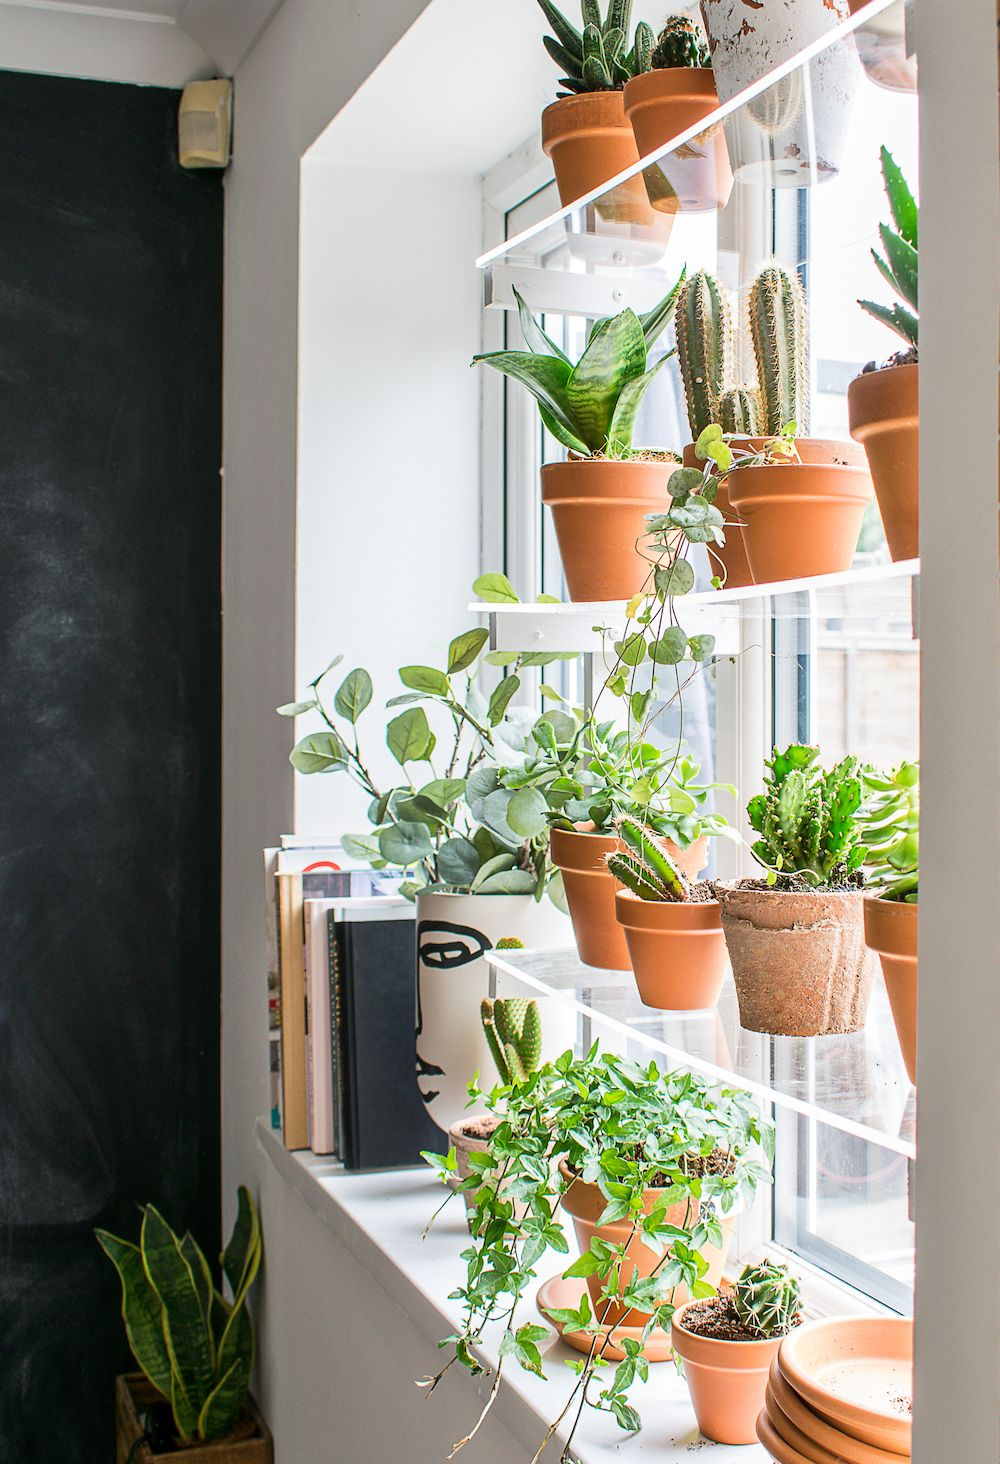 Diy Floating Window Plant Shelf Tutorial Window Plants Plant